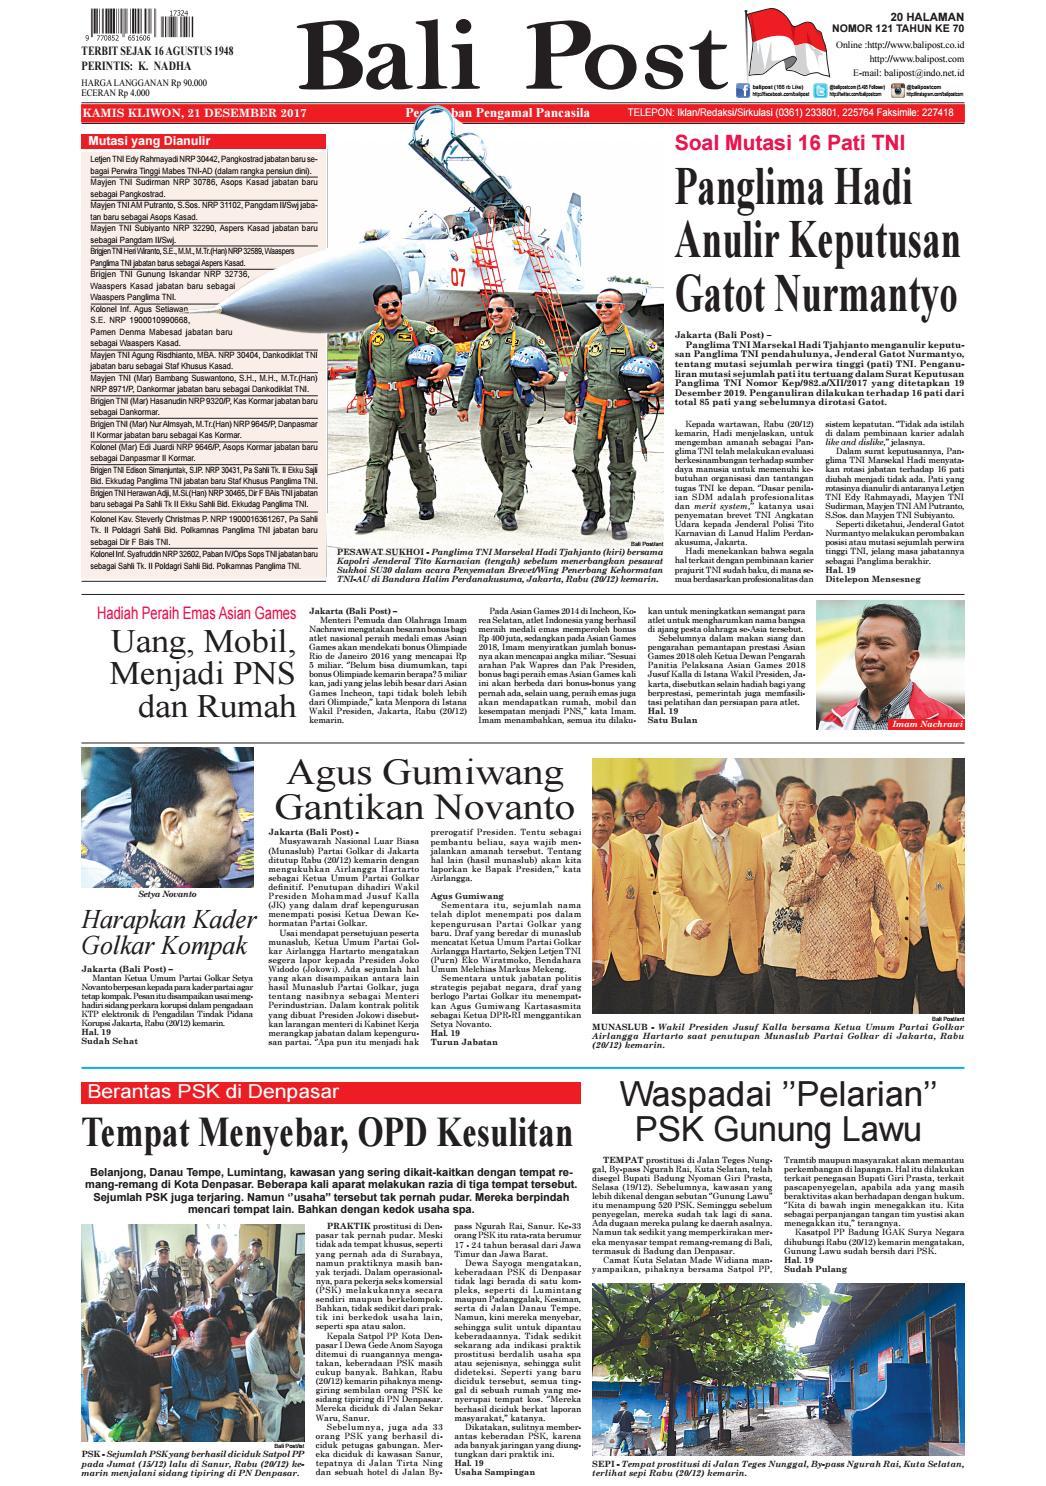 Edisi 21 Desember 2017 Balipostcom By E Paper Kmb Issuu Produk Ukm Bumn Handbody